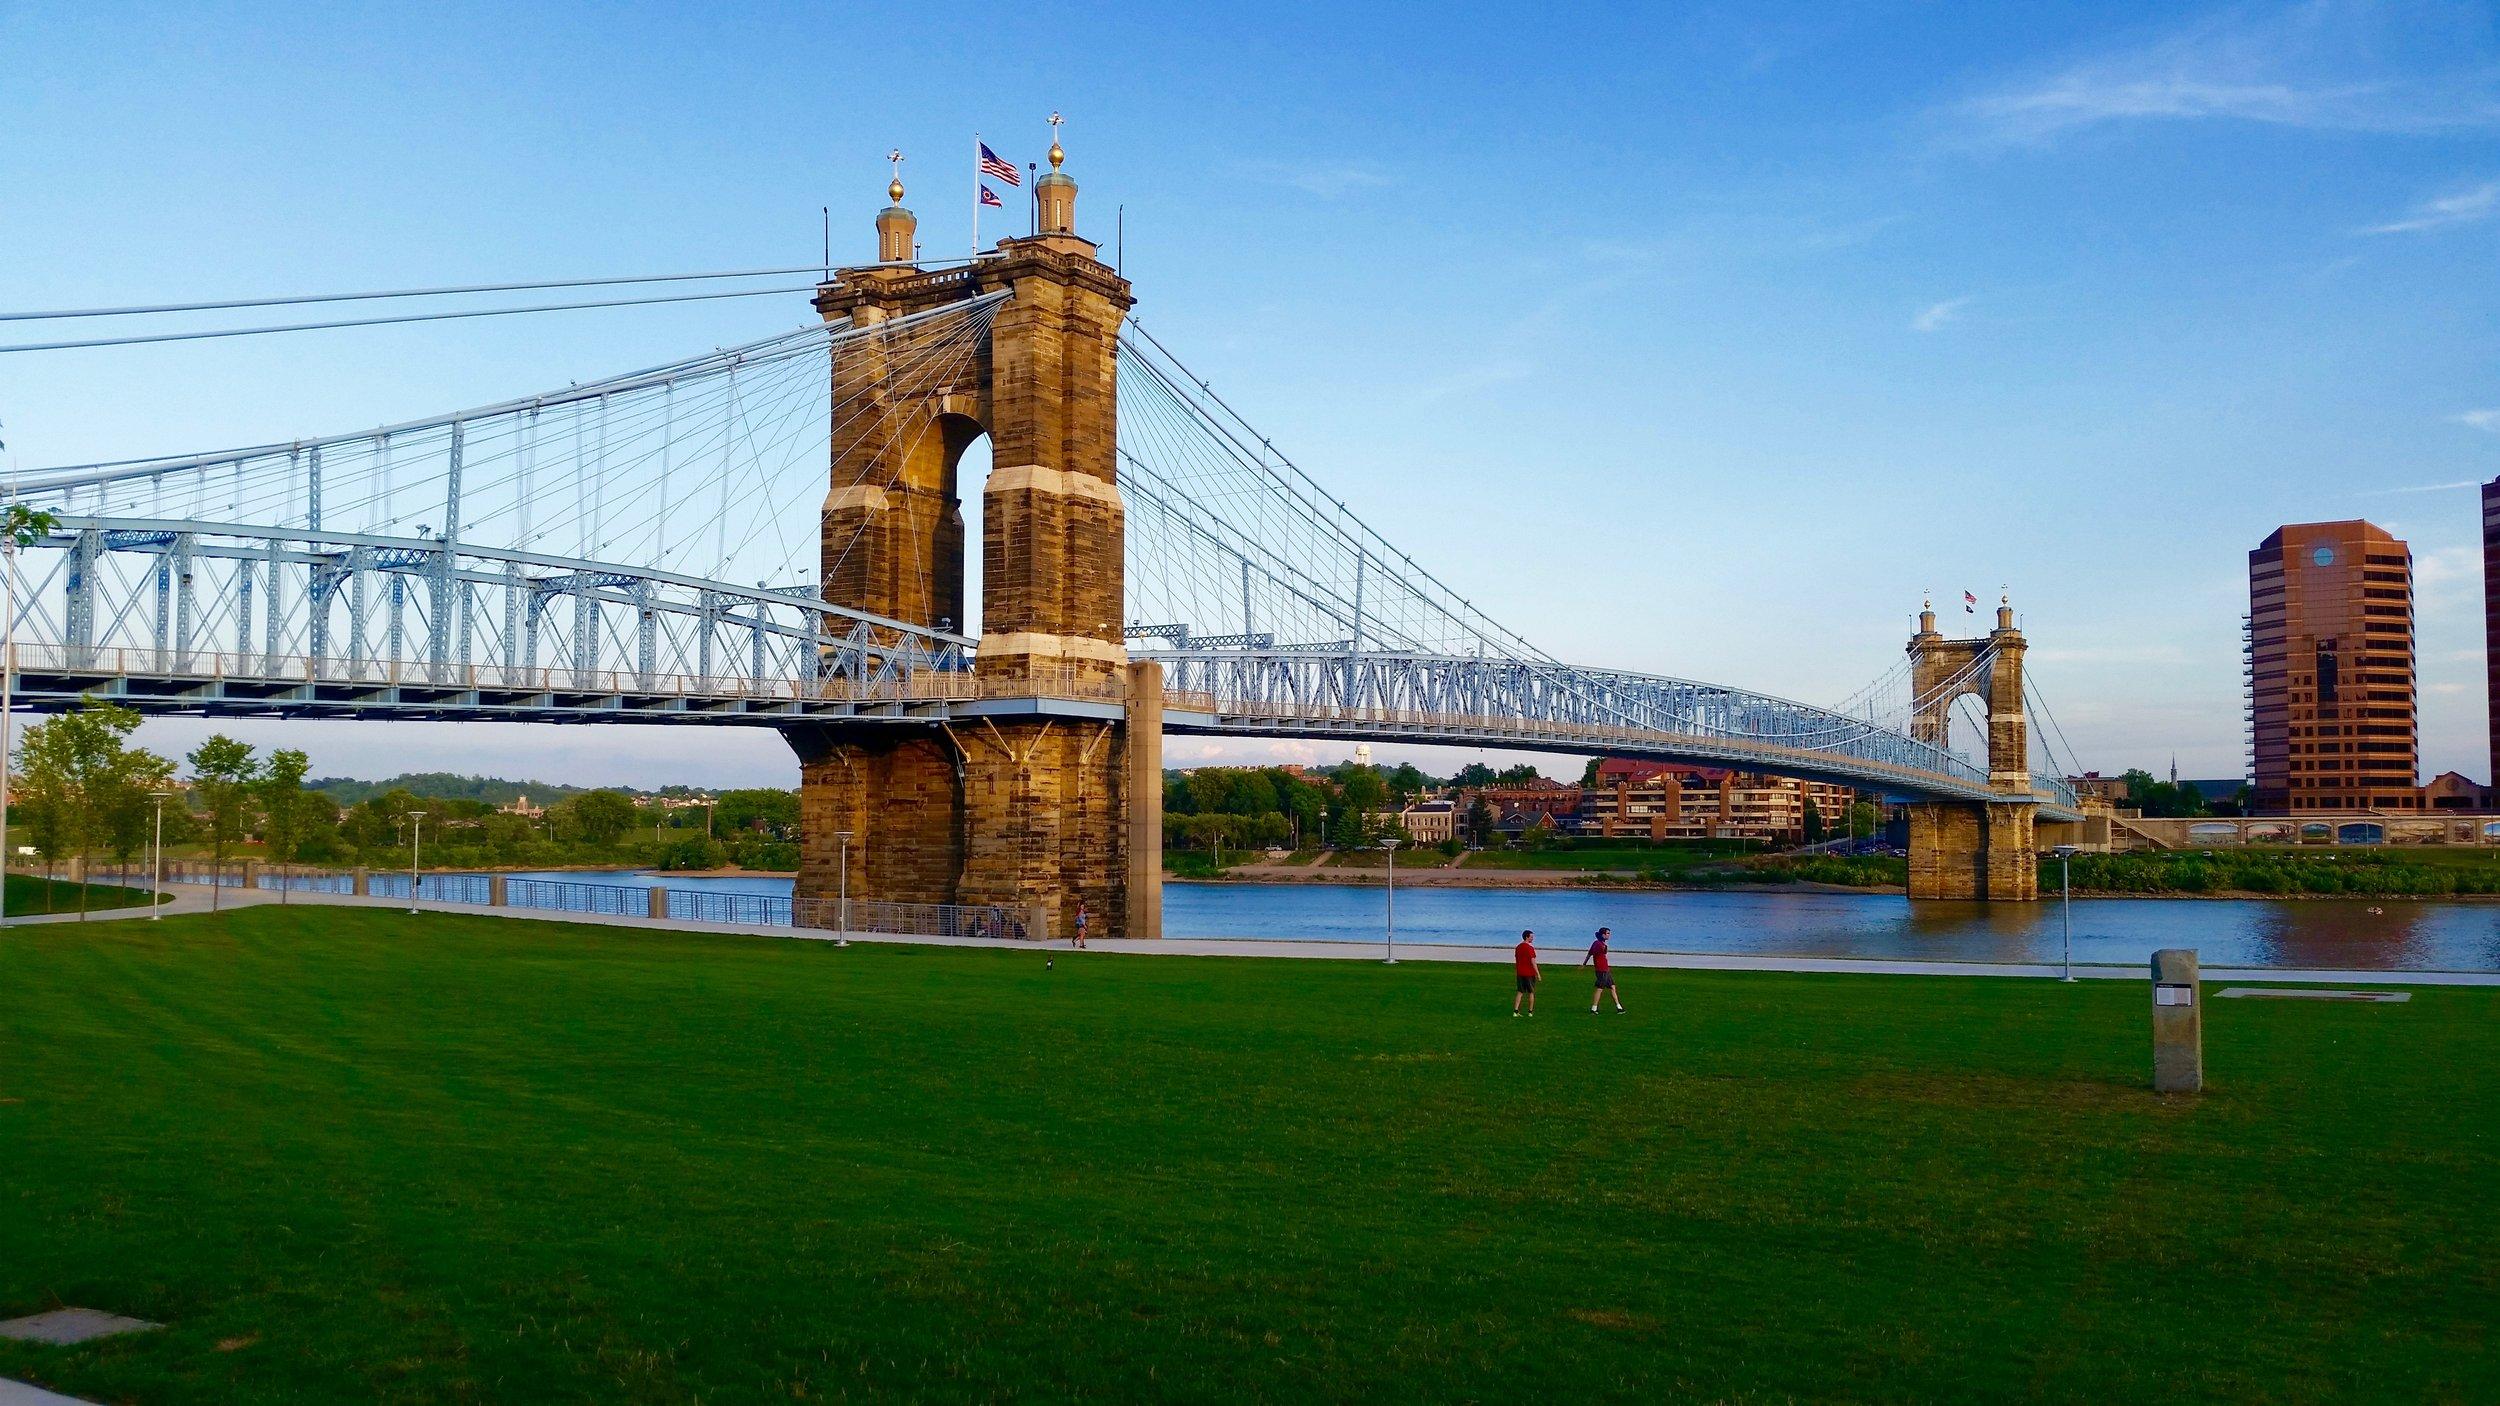 The Roebling Suspension Bridge, connecting Cincinnati to Covington, Kentucky